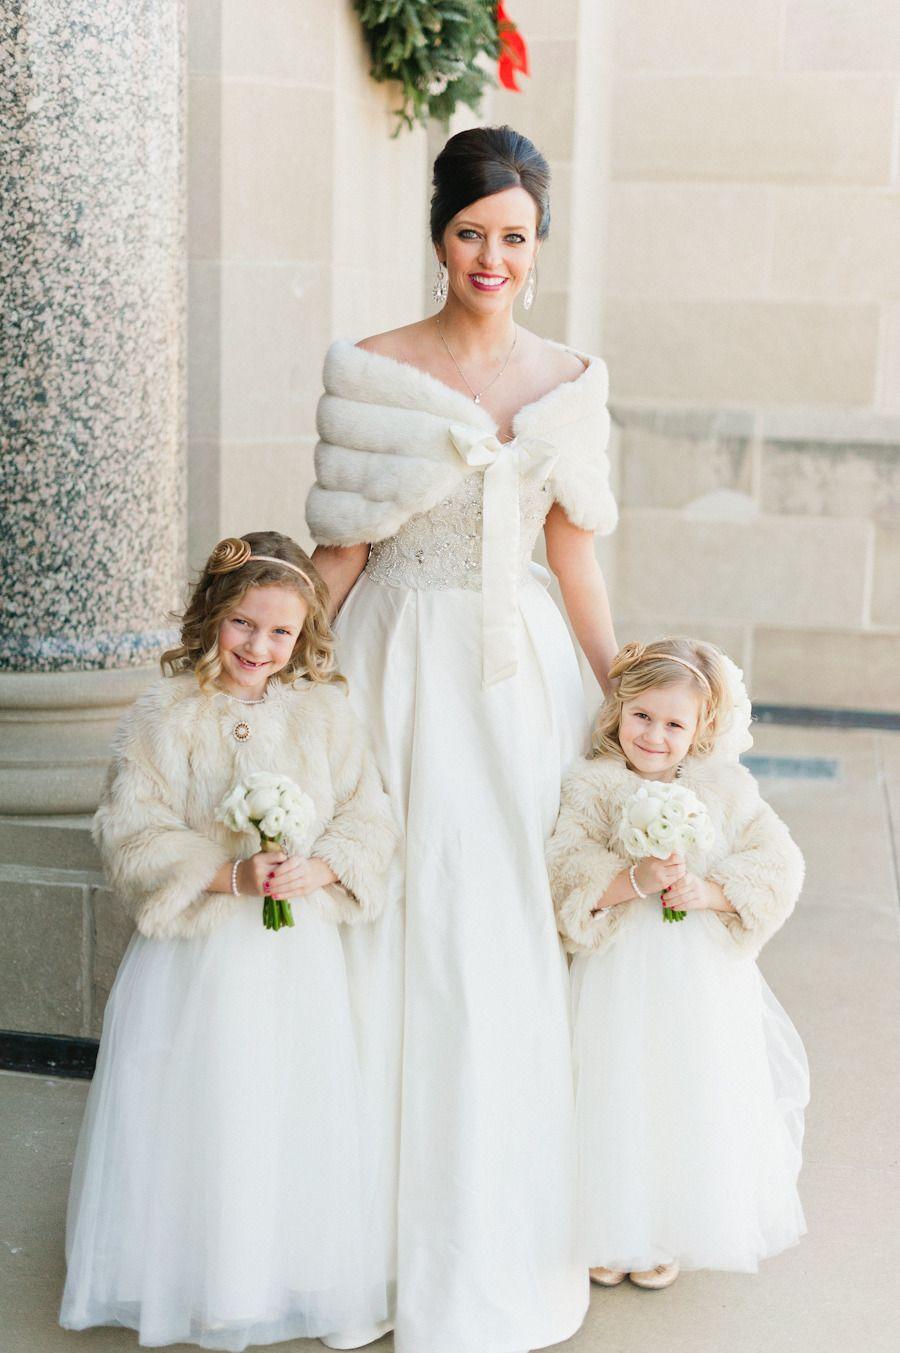 Winter Wedding Faux Fur Warm & Pretty. Love it for the